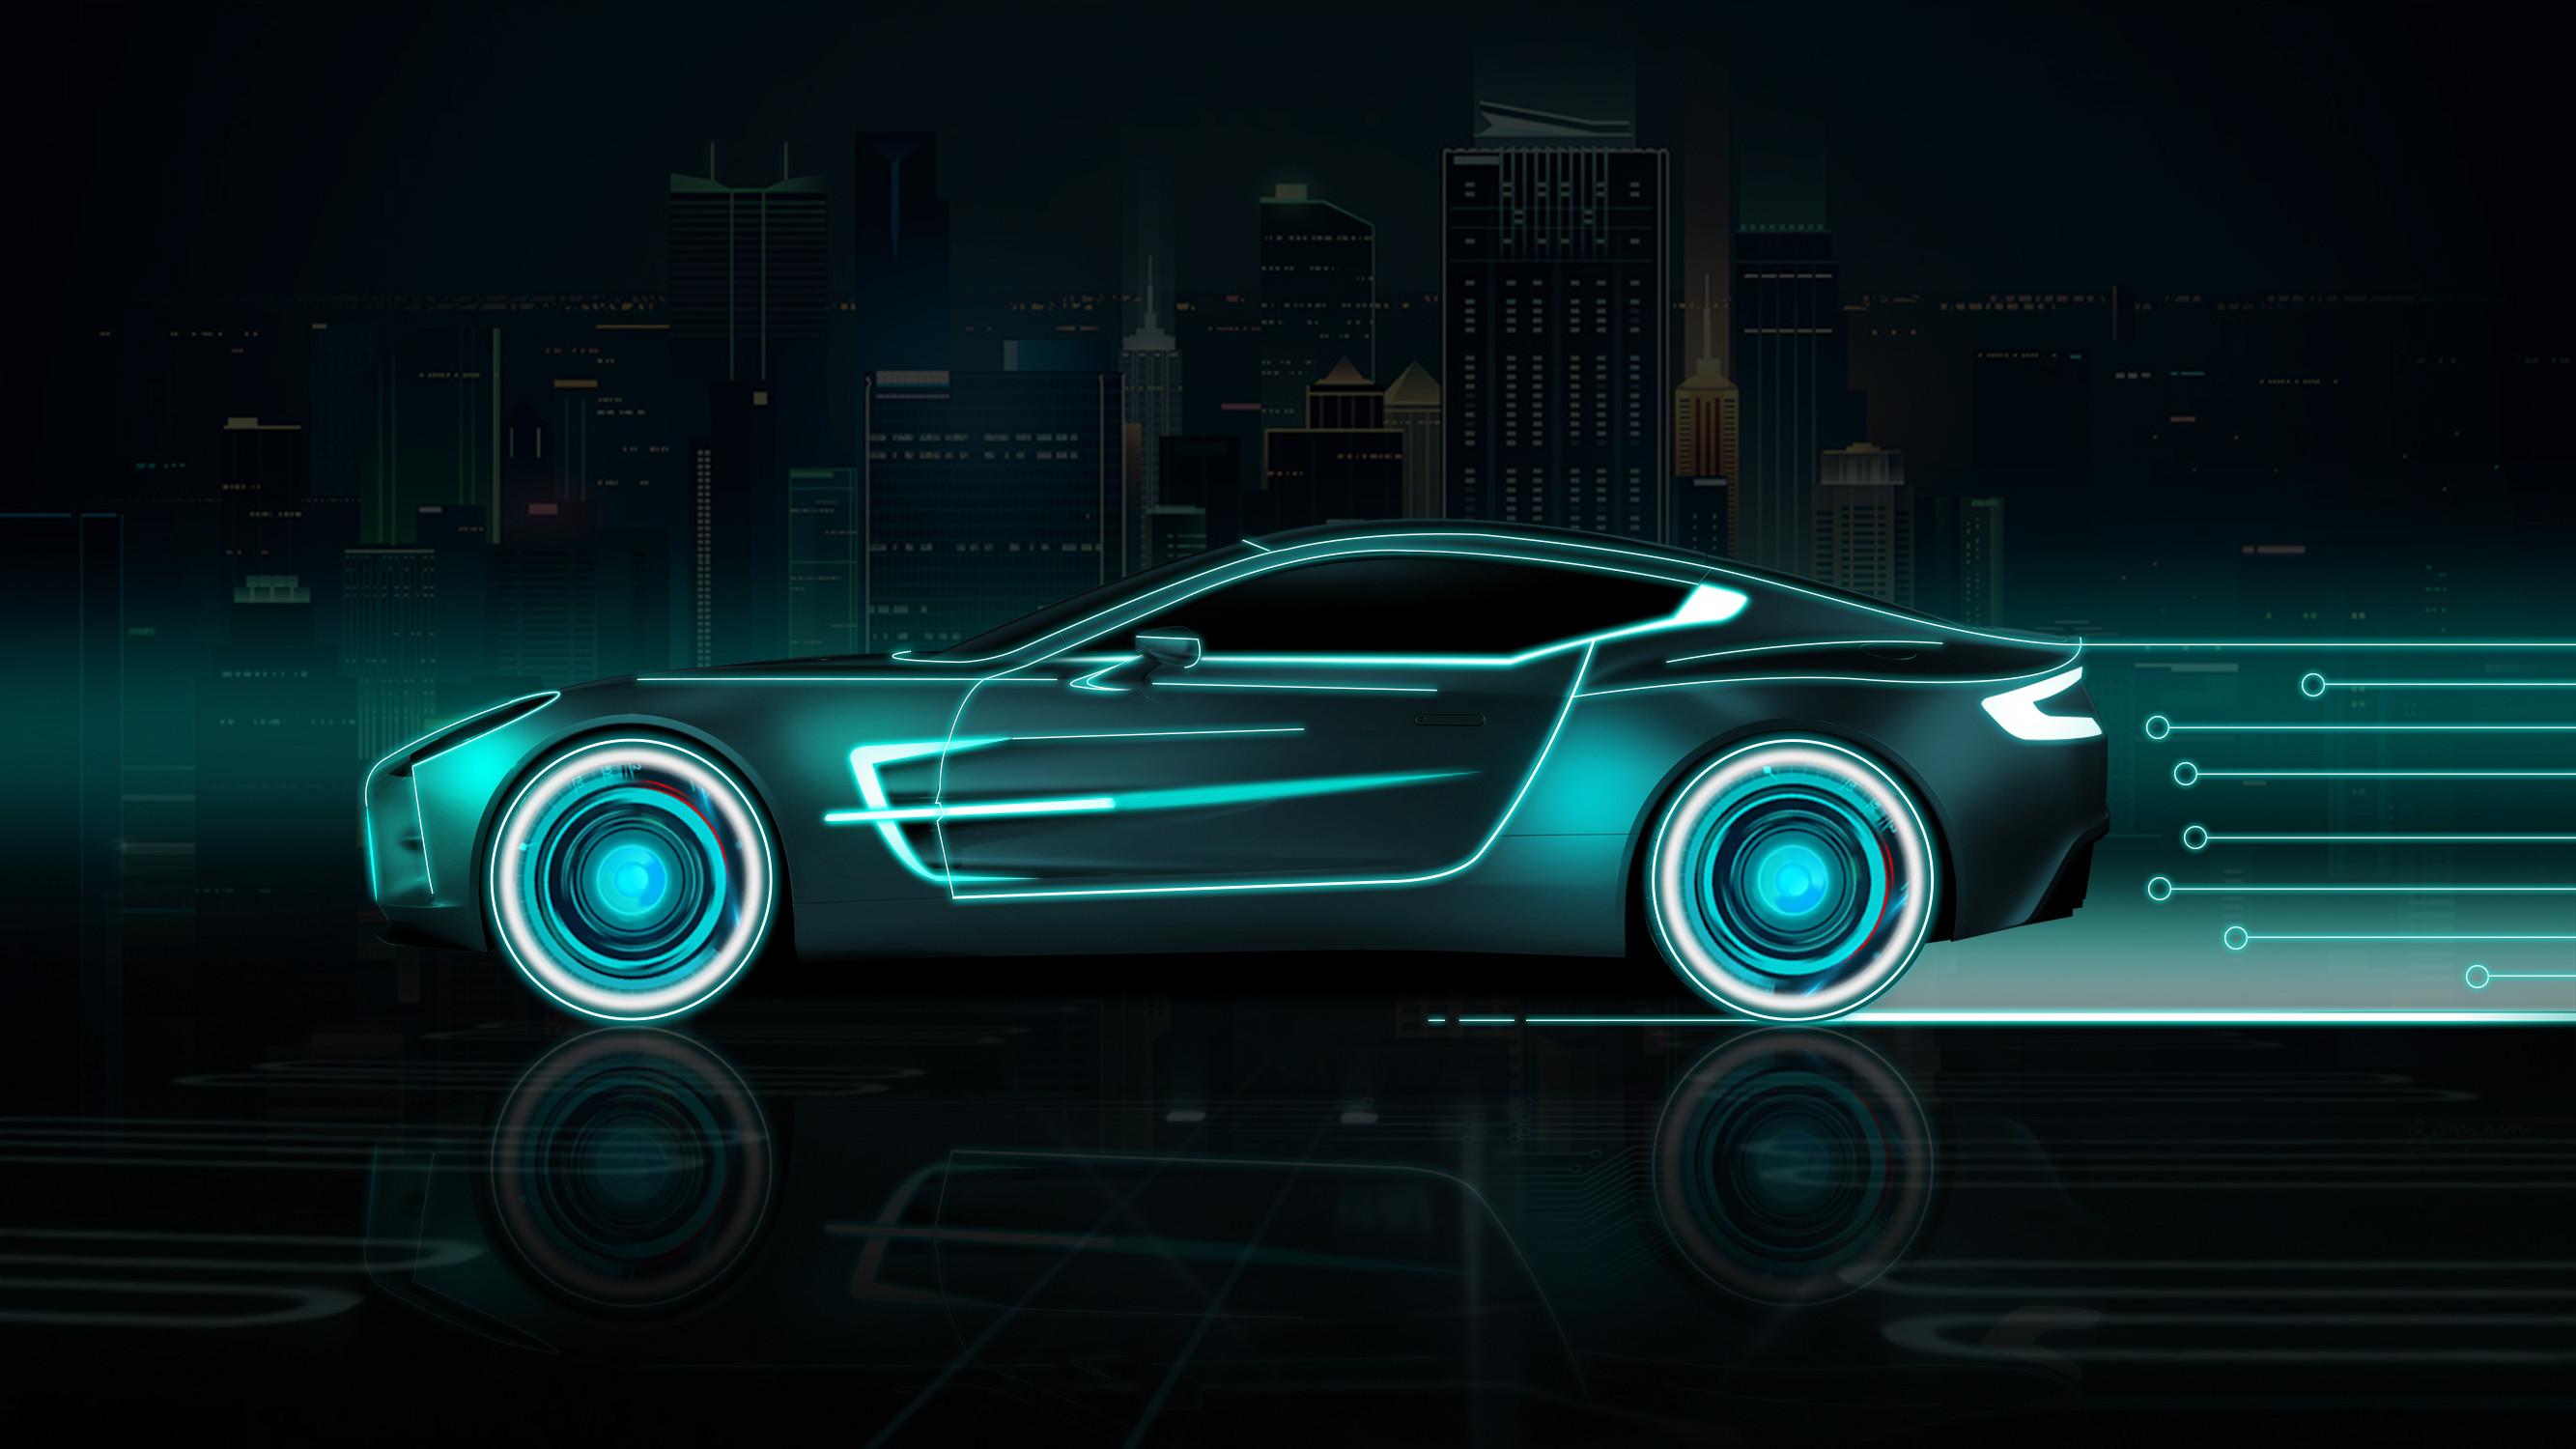 1920x1080 1920x1080 Wallpaper Cars, Lights, Neon